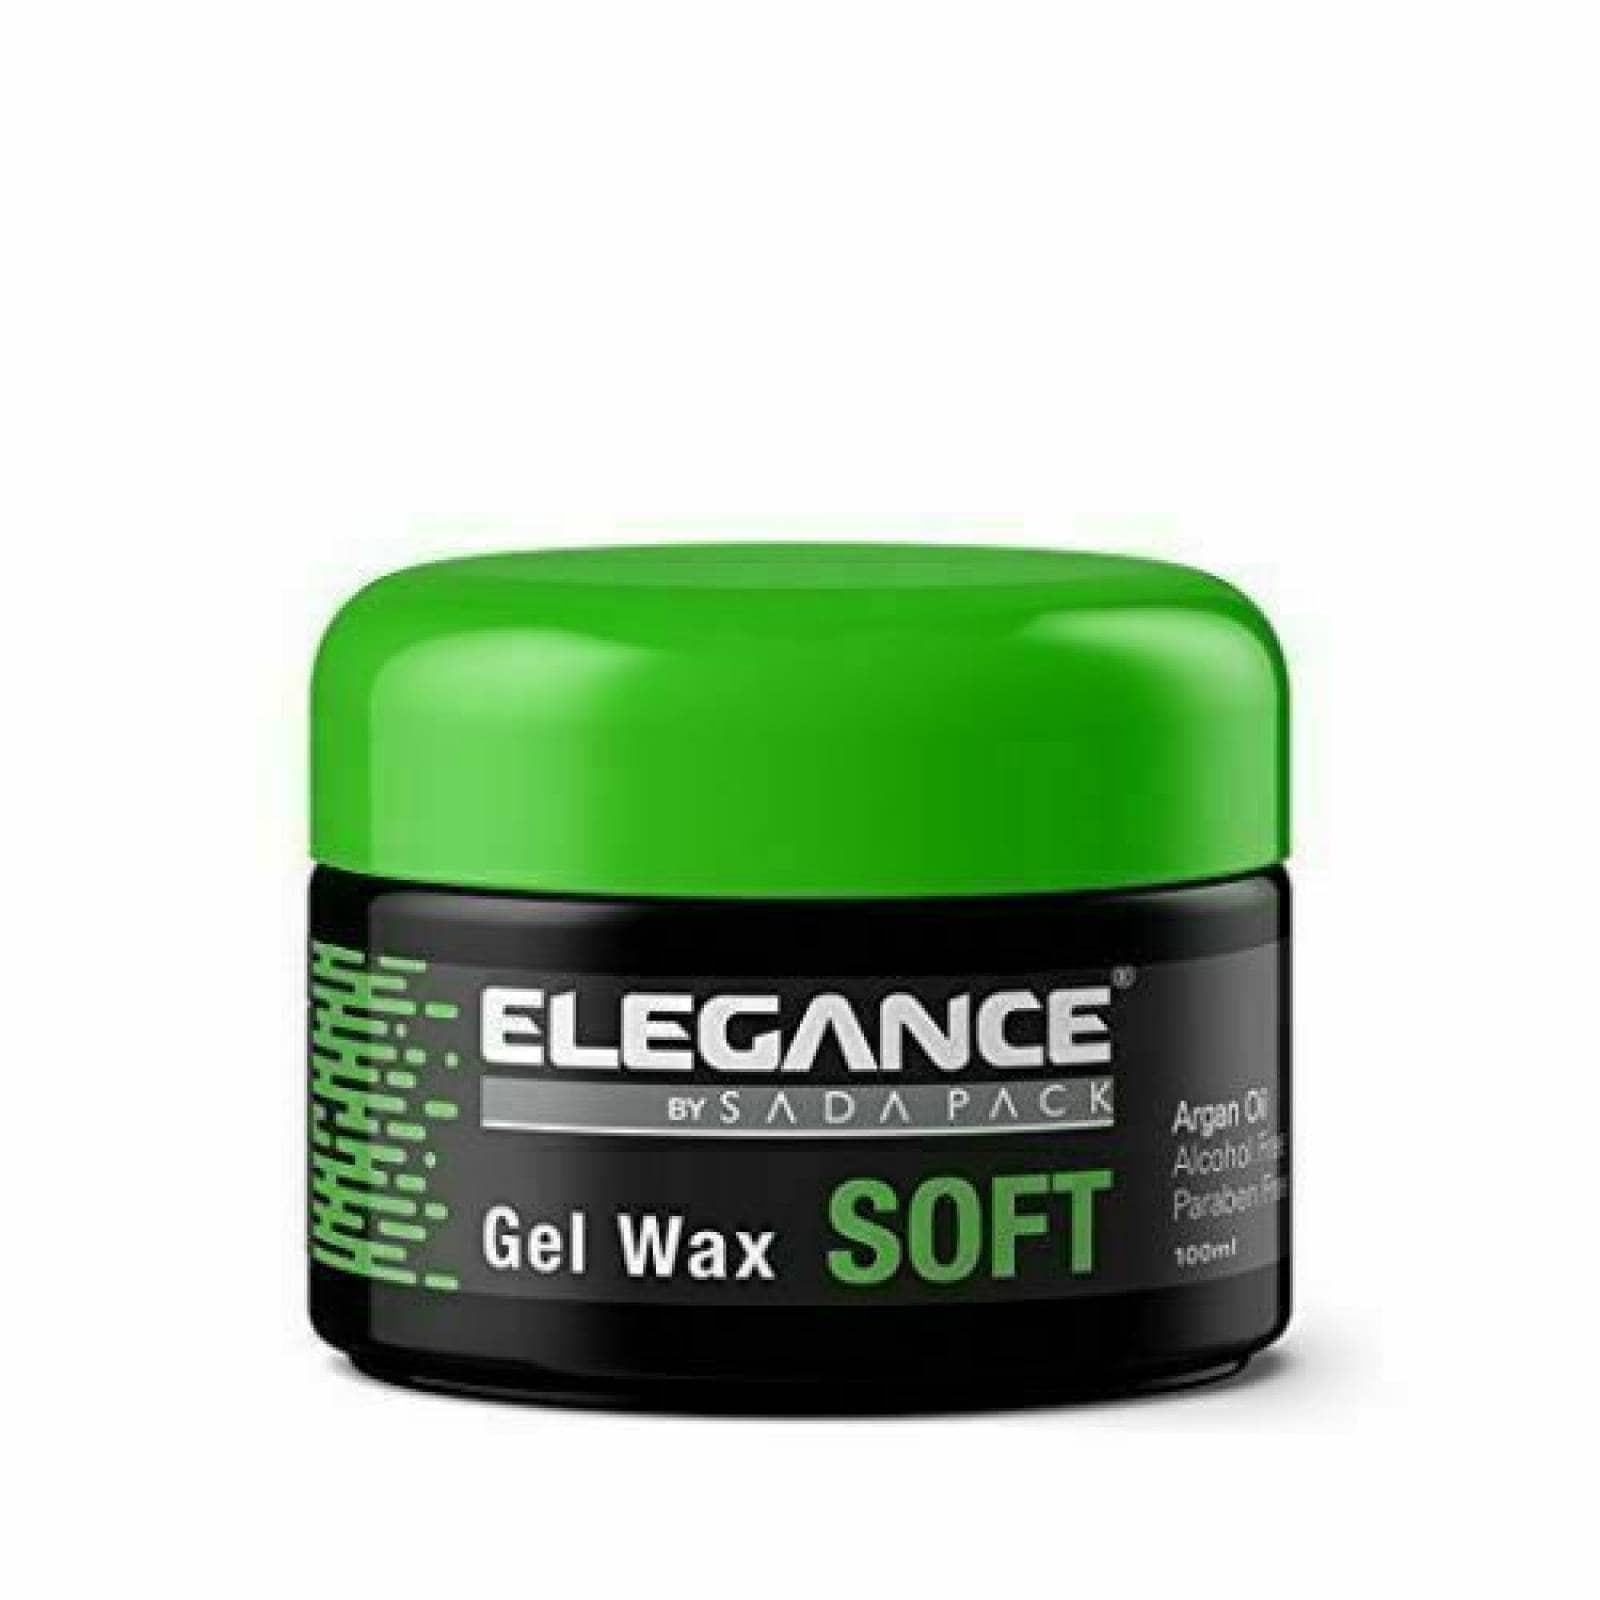 Cera Gel Suave para cabello Elgance  100 ml, Cera con textura Suave para Cabello.